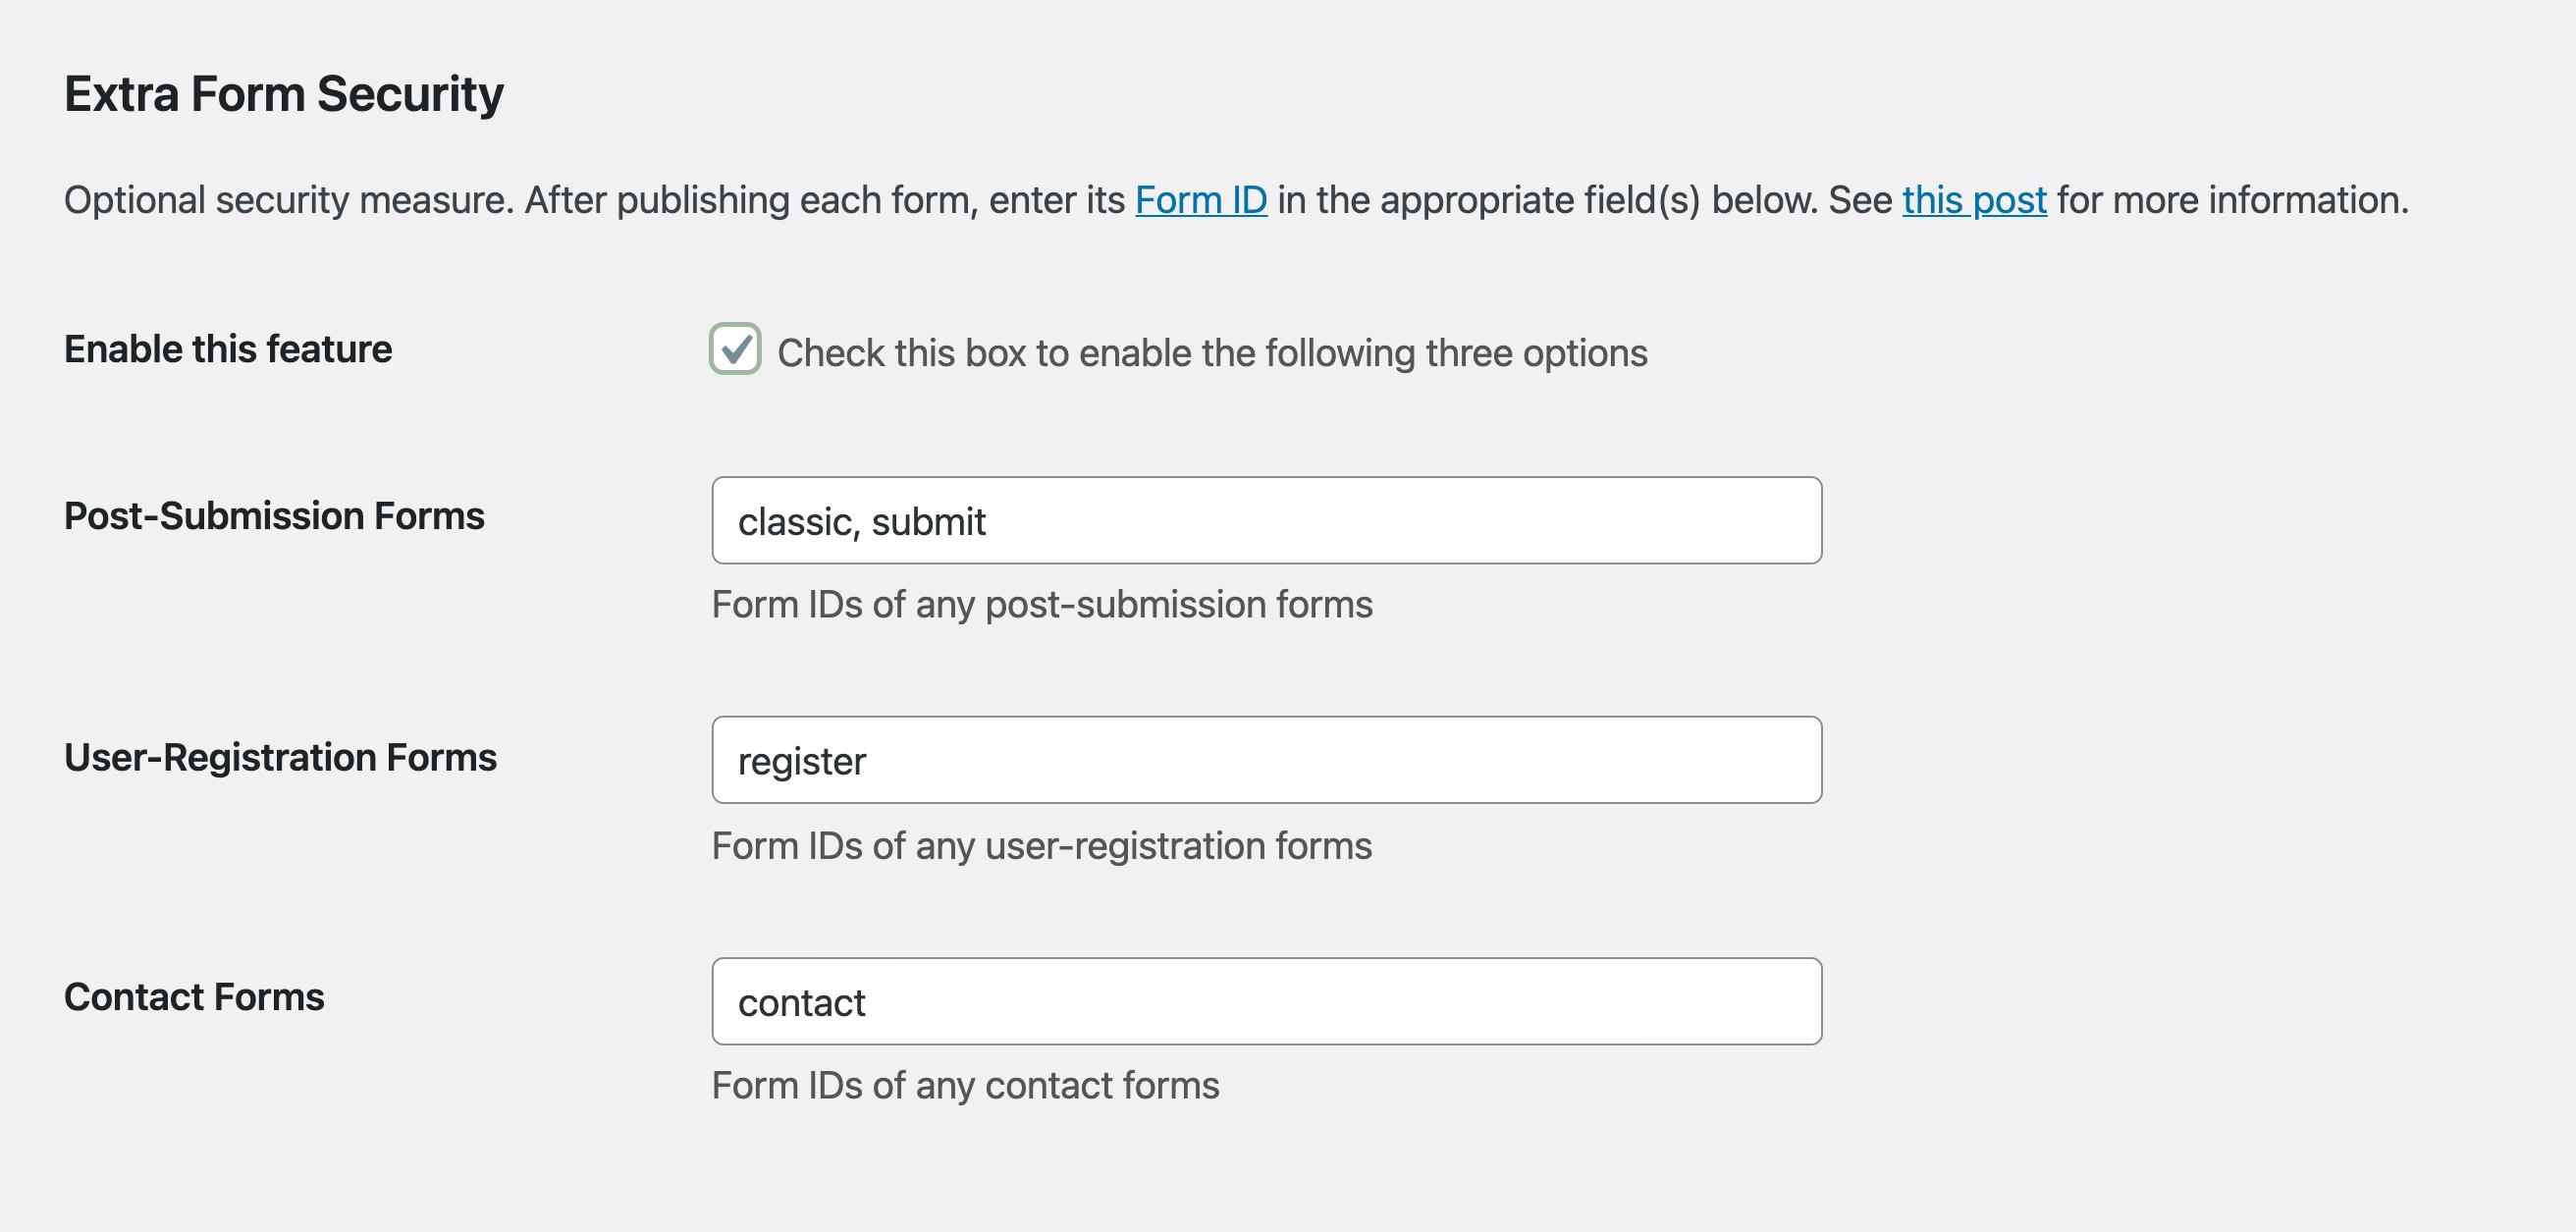 USP Pro - Extra Form Security Regular Forms